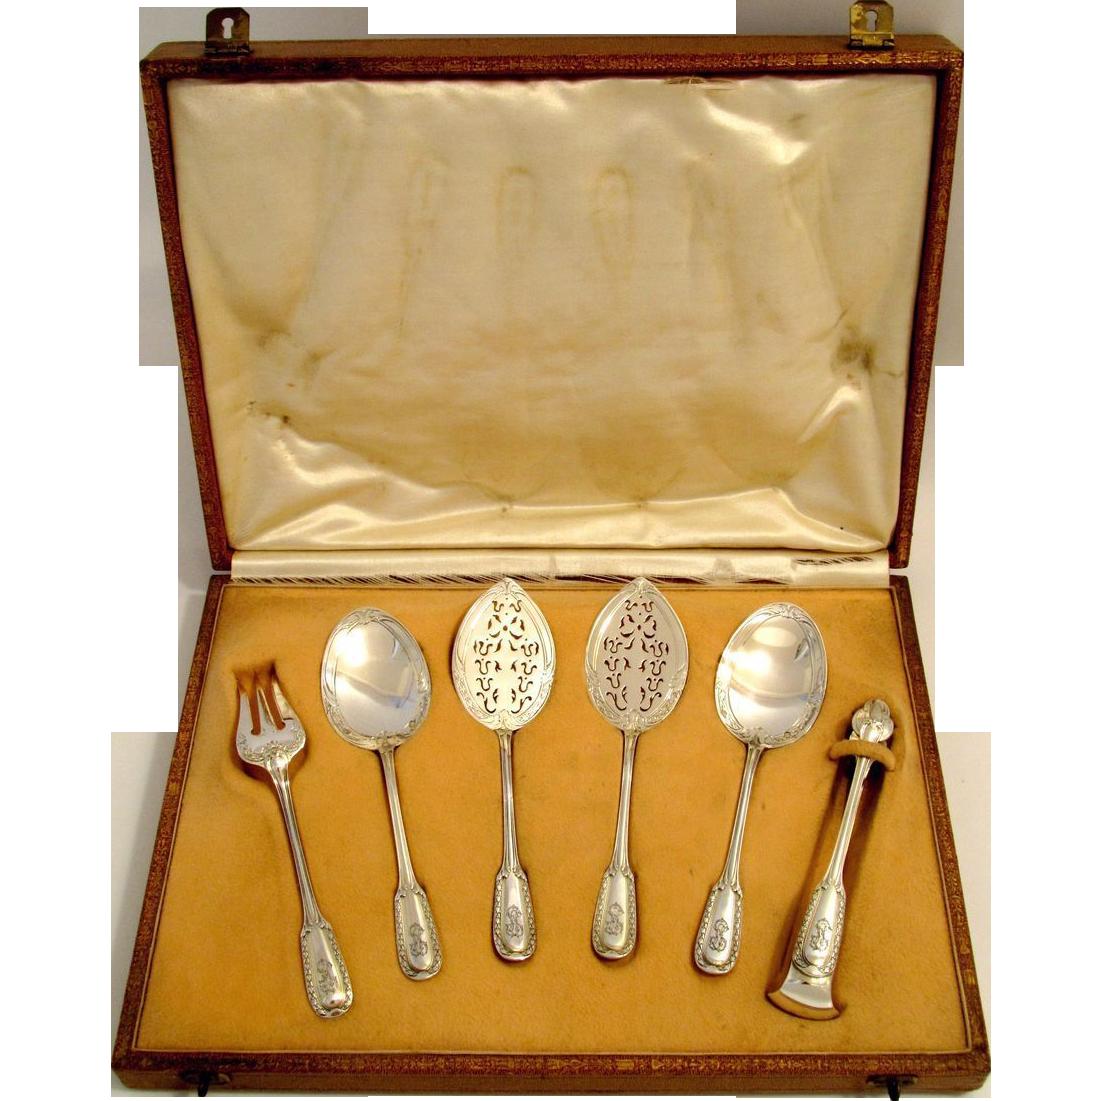 Puiforcat French Sterling Silver Dessert/Hors D'oeuvre Set 6 pc w/Box Louis XVI